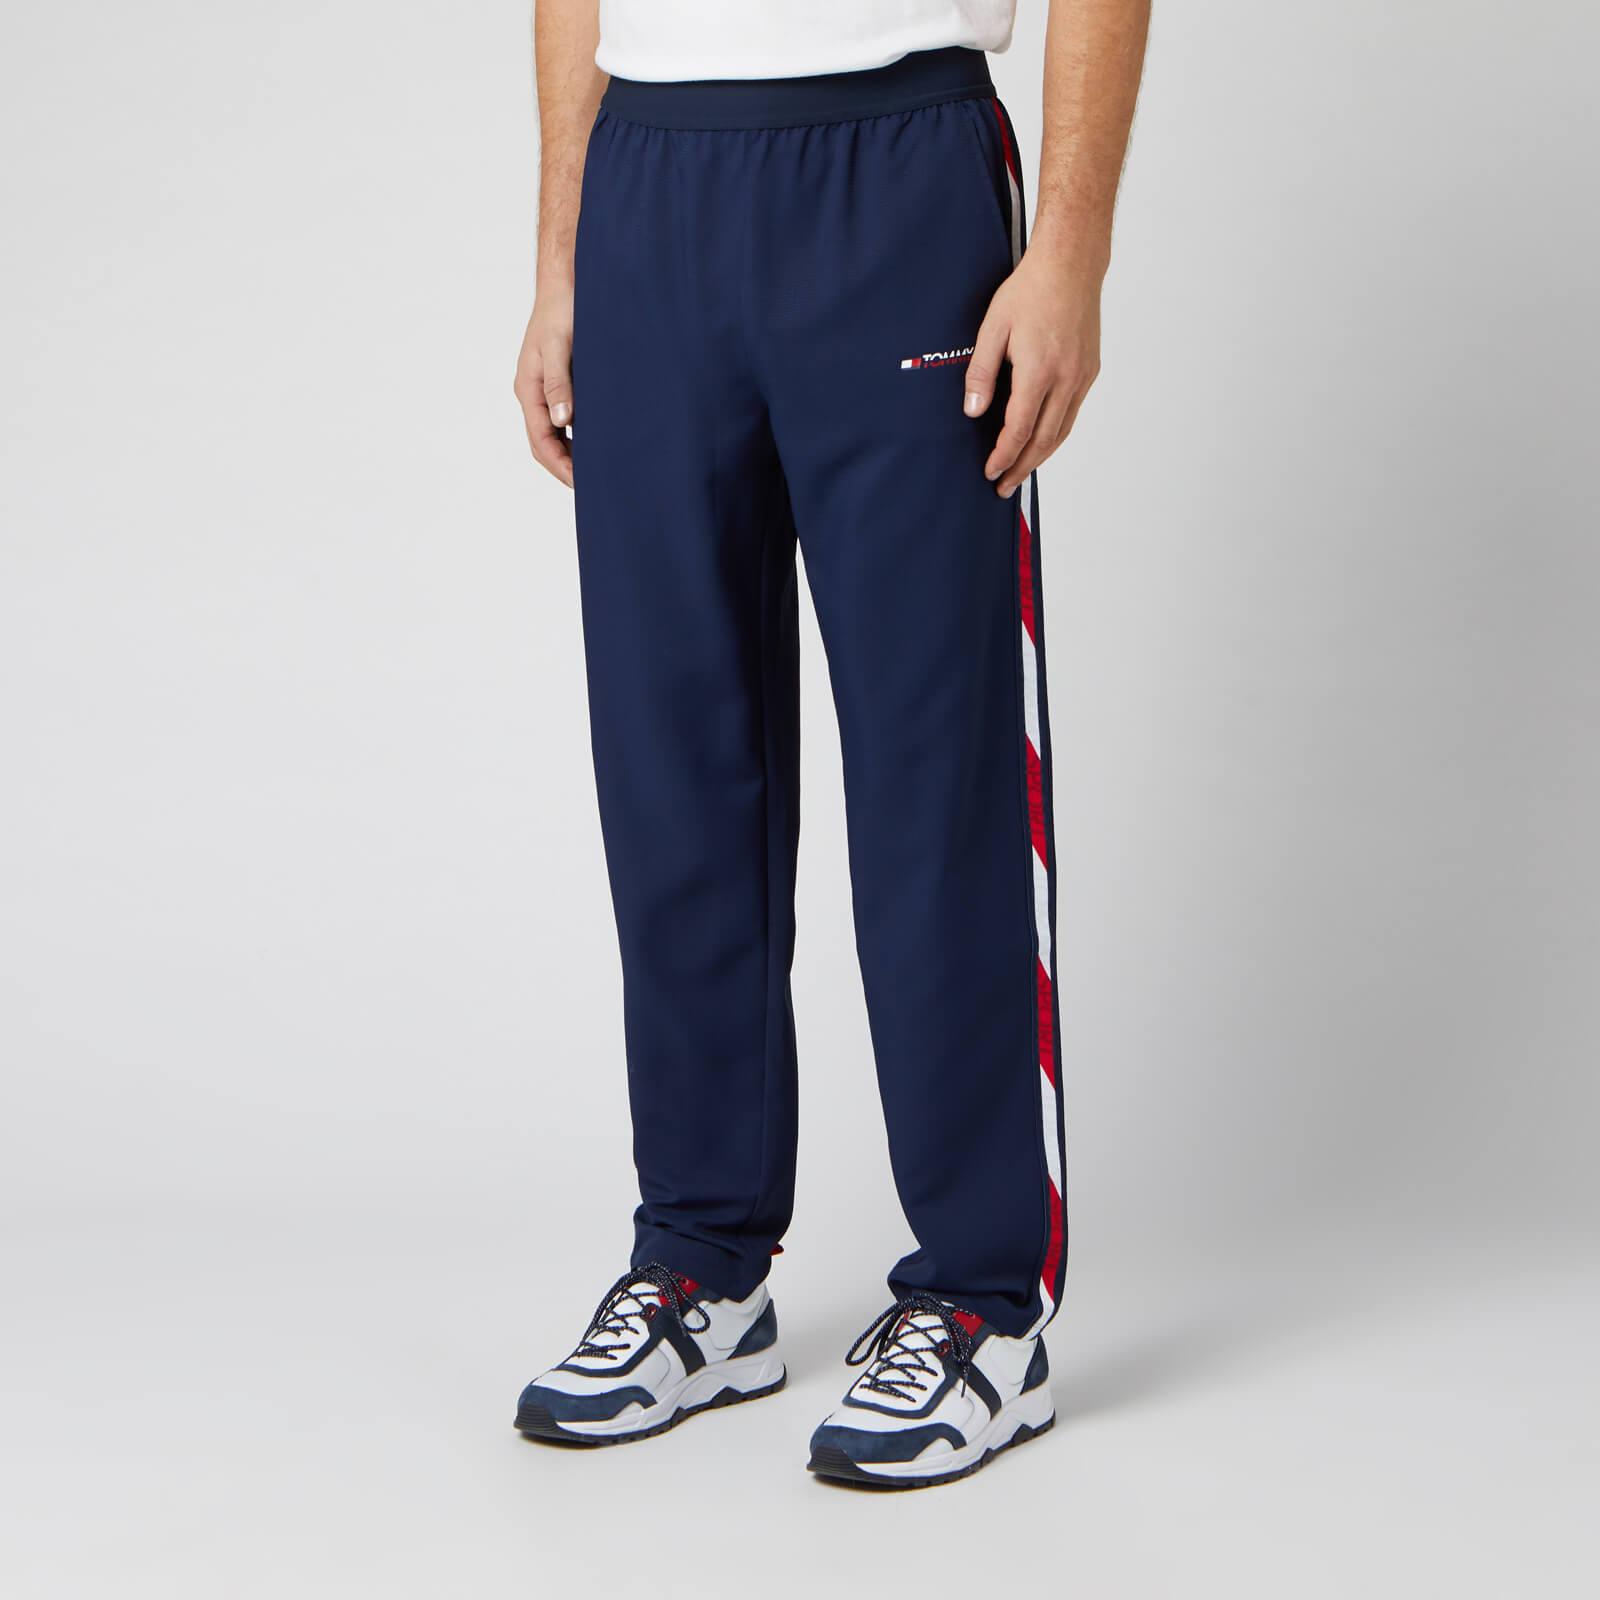 Tommy Hilfiger Sport Men's Woven Tape Pants - Sport Navy - M